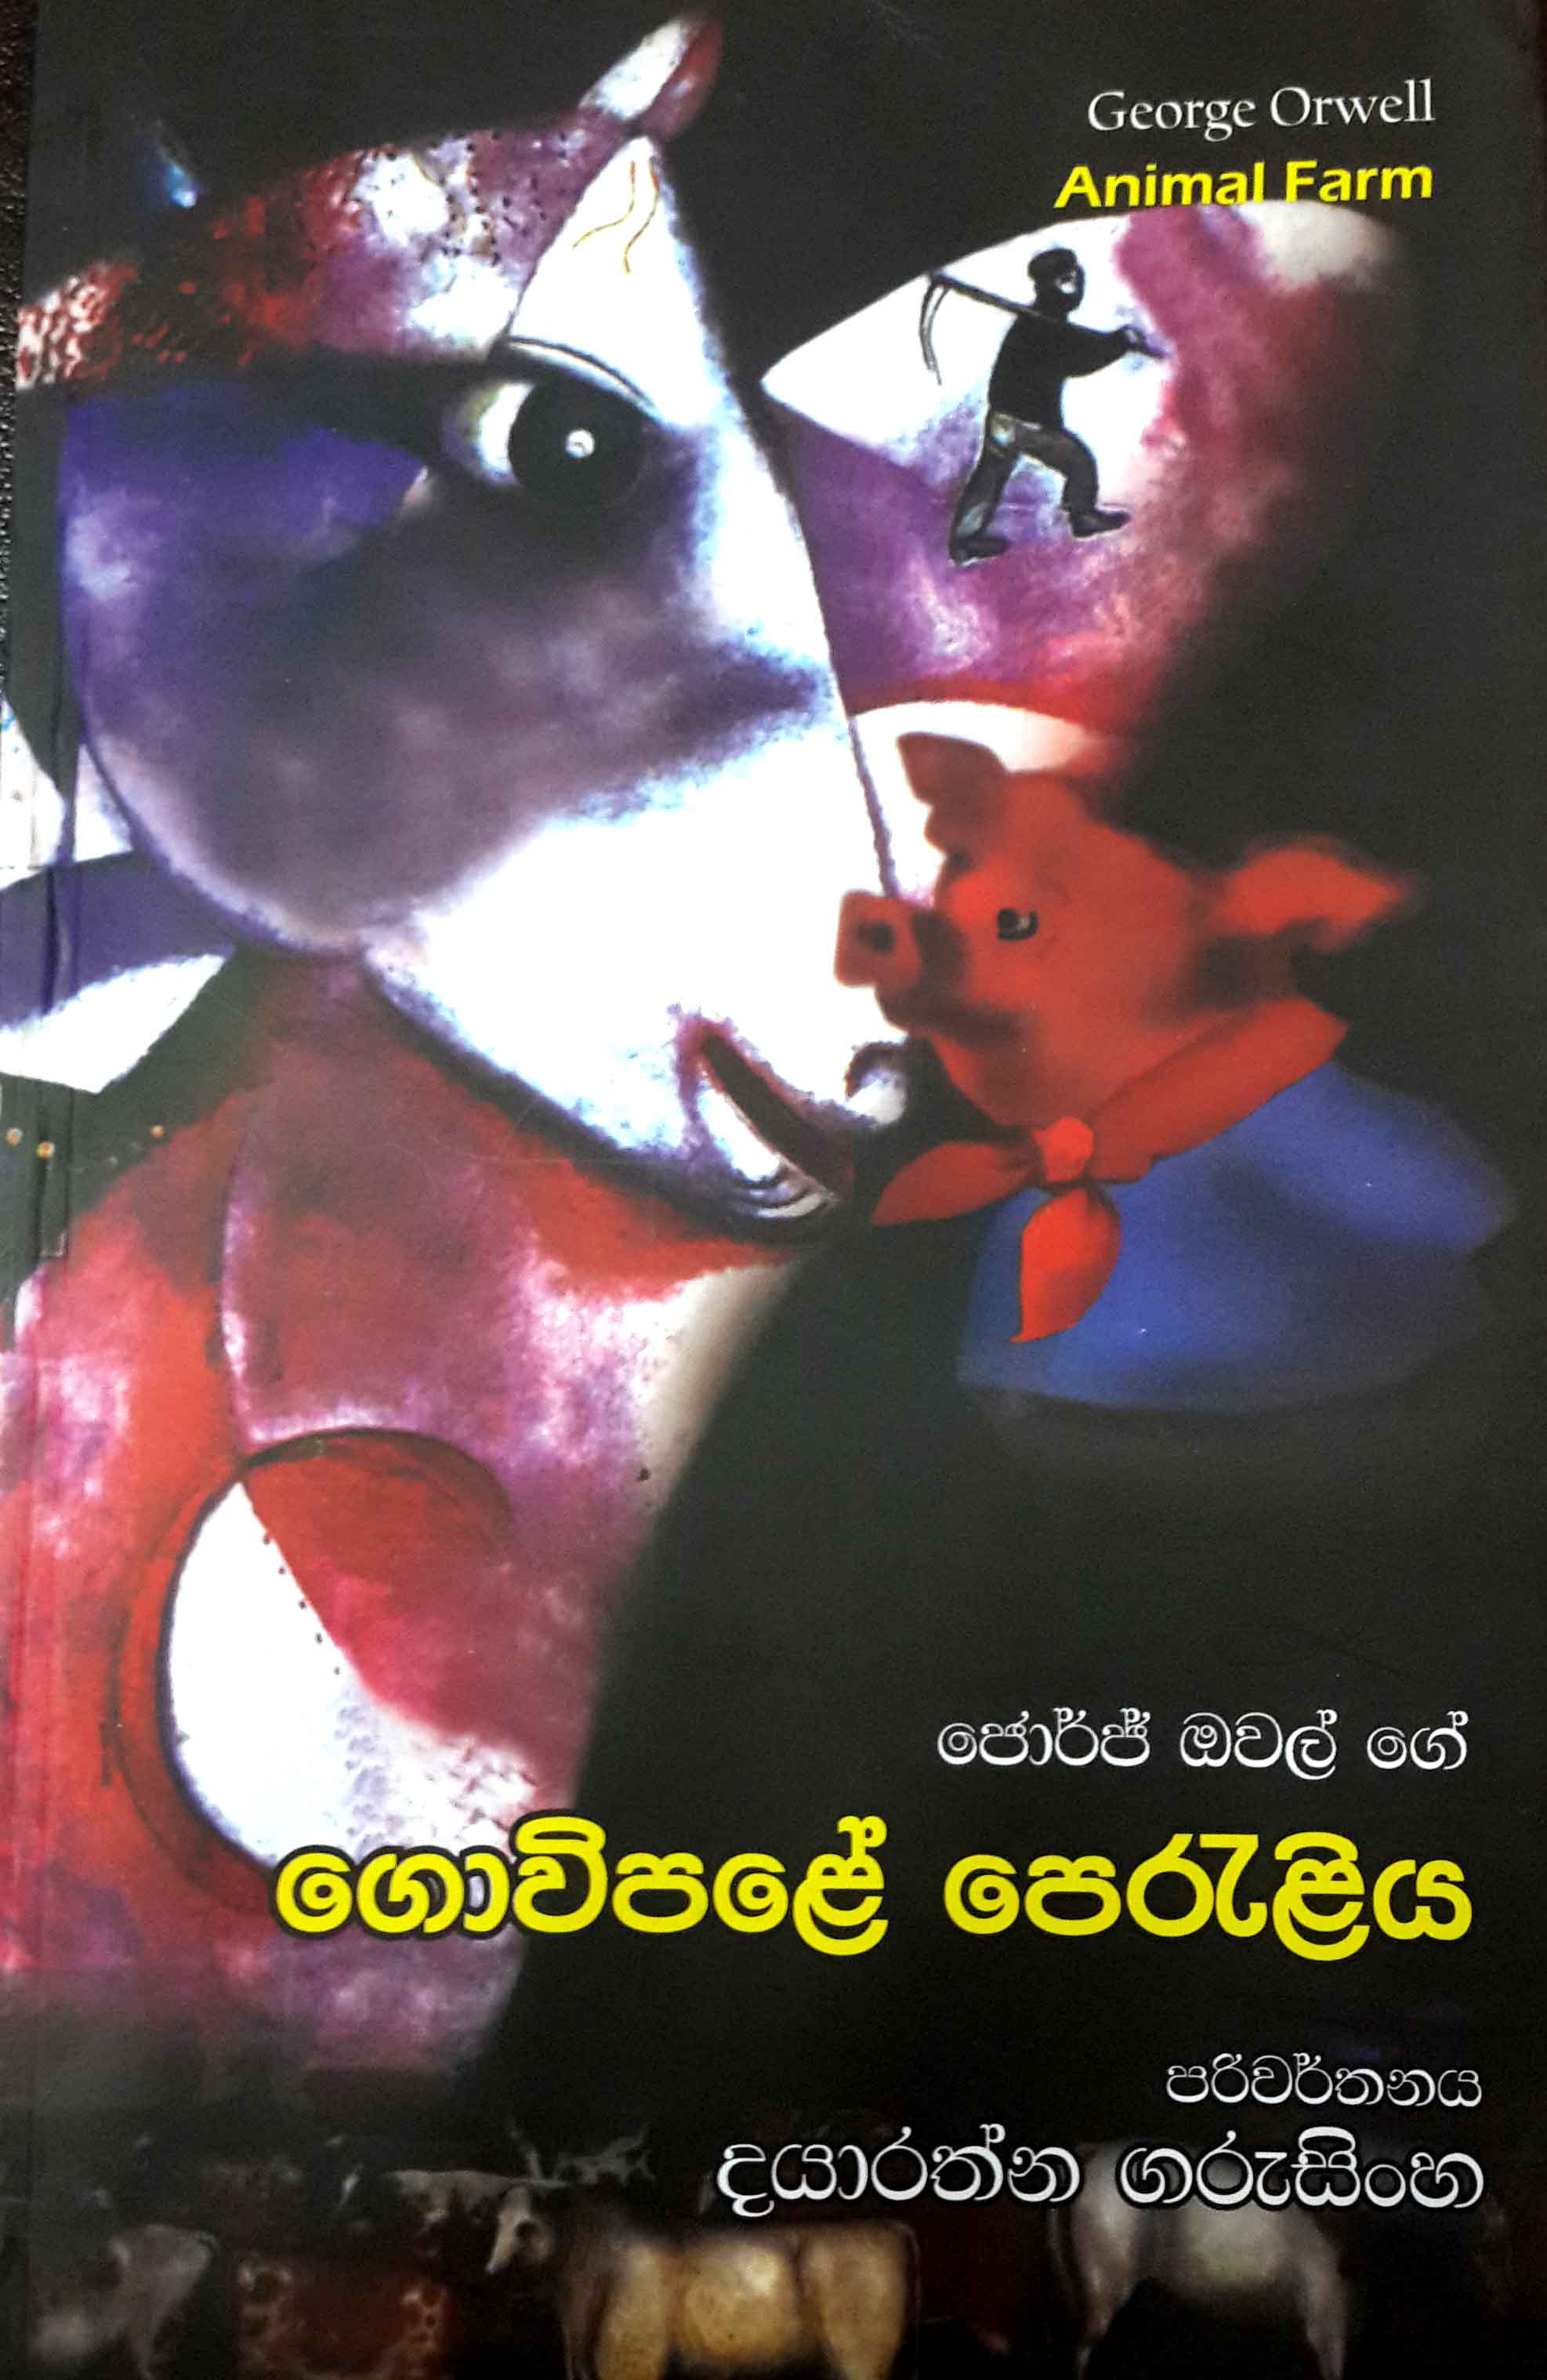 Govipale Peraliya ( Sinhala translation of George Orwell's